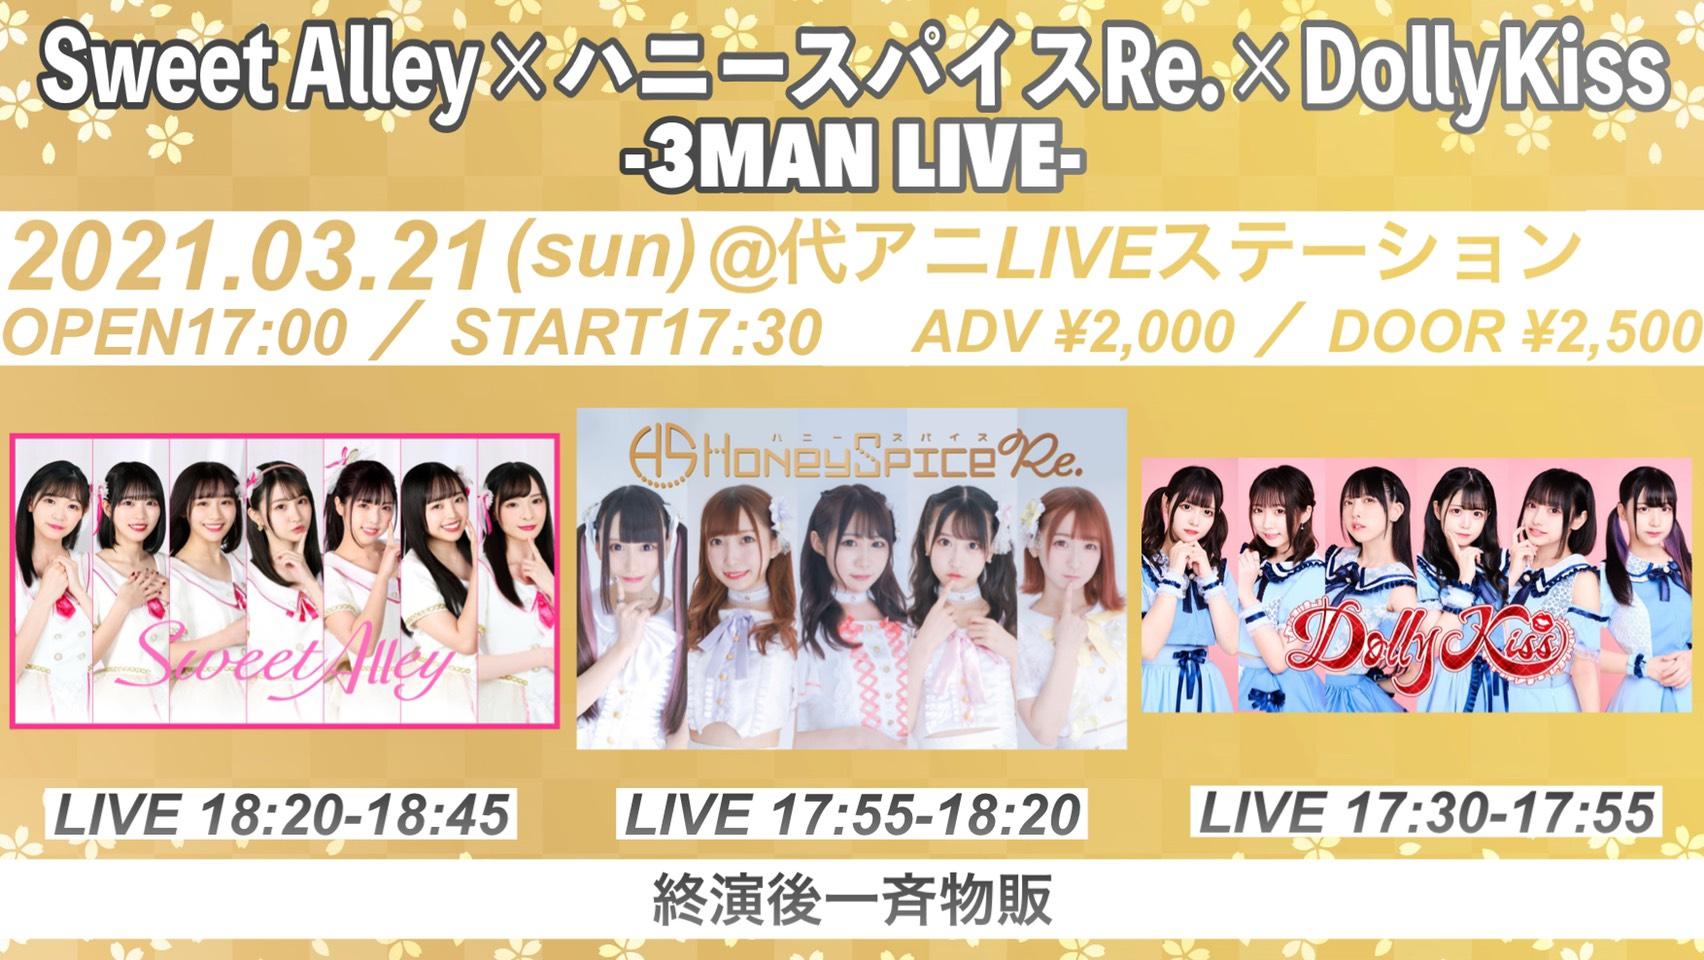 Sweet Alley×ハニースパイスRe.×DollyKiss-3MAN LIVE-